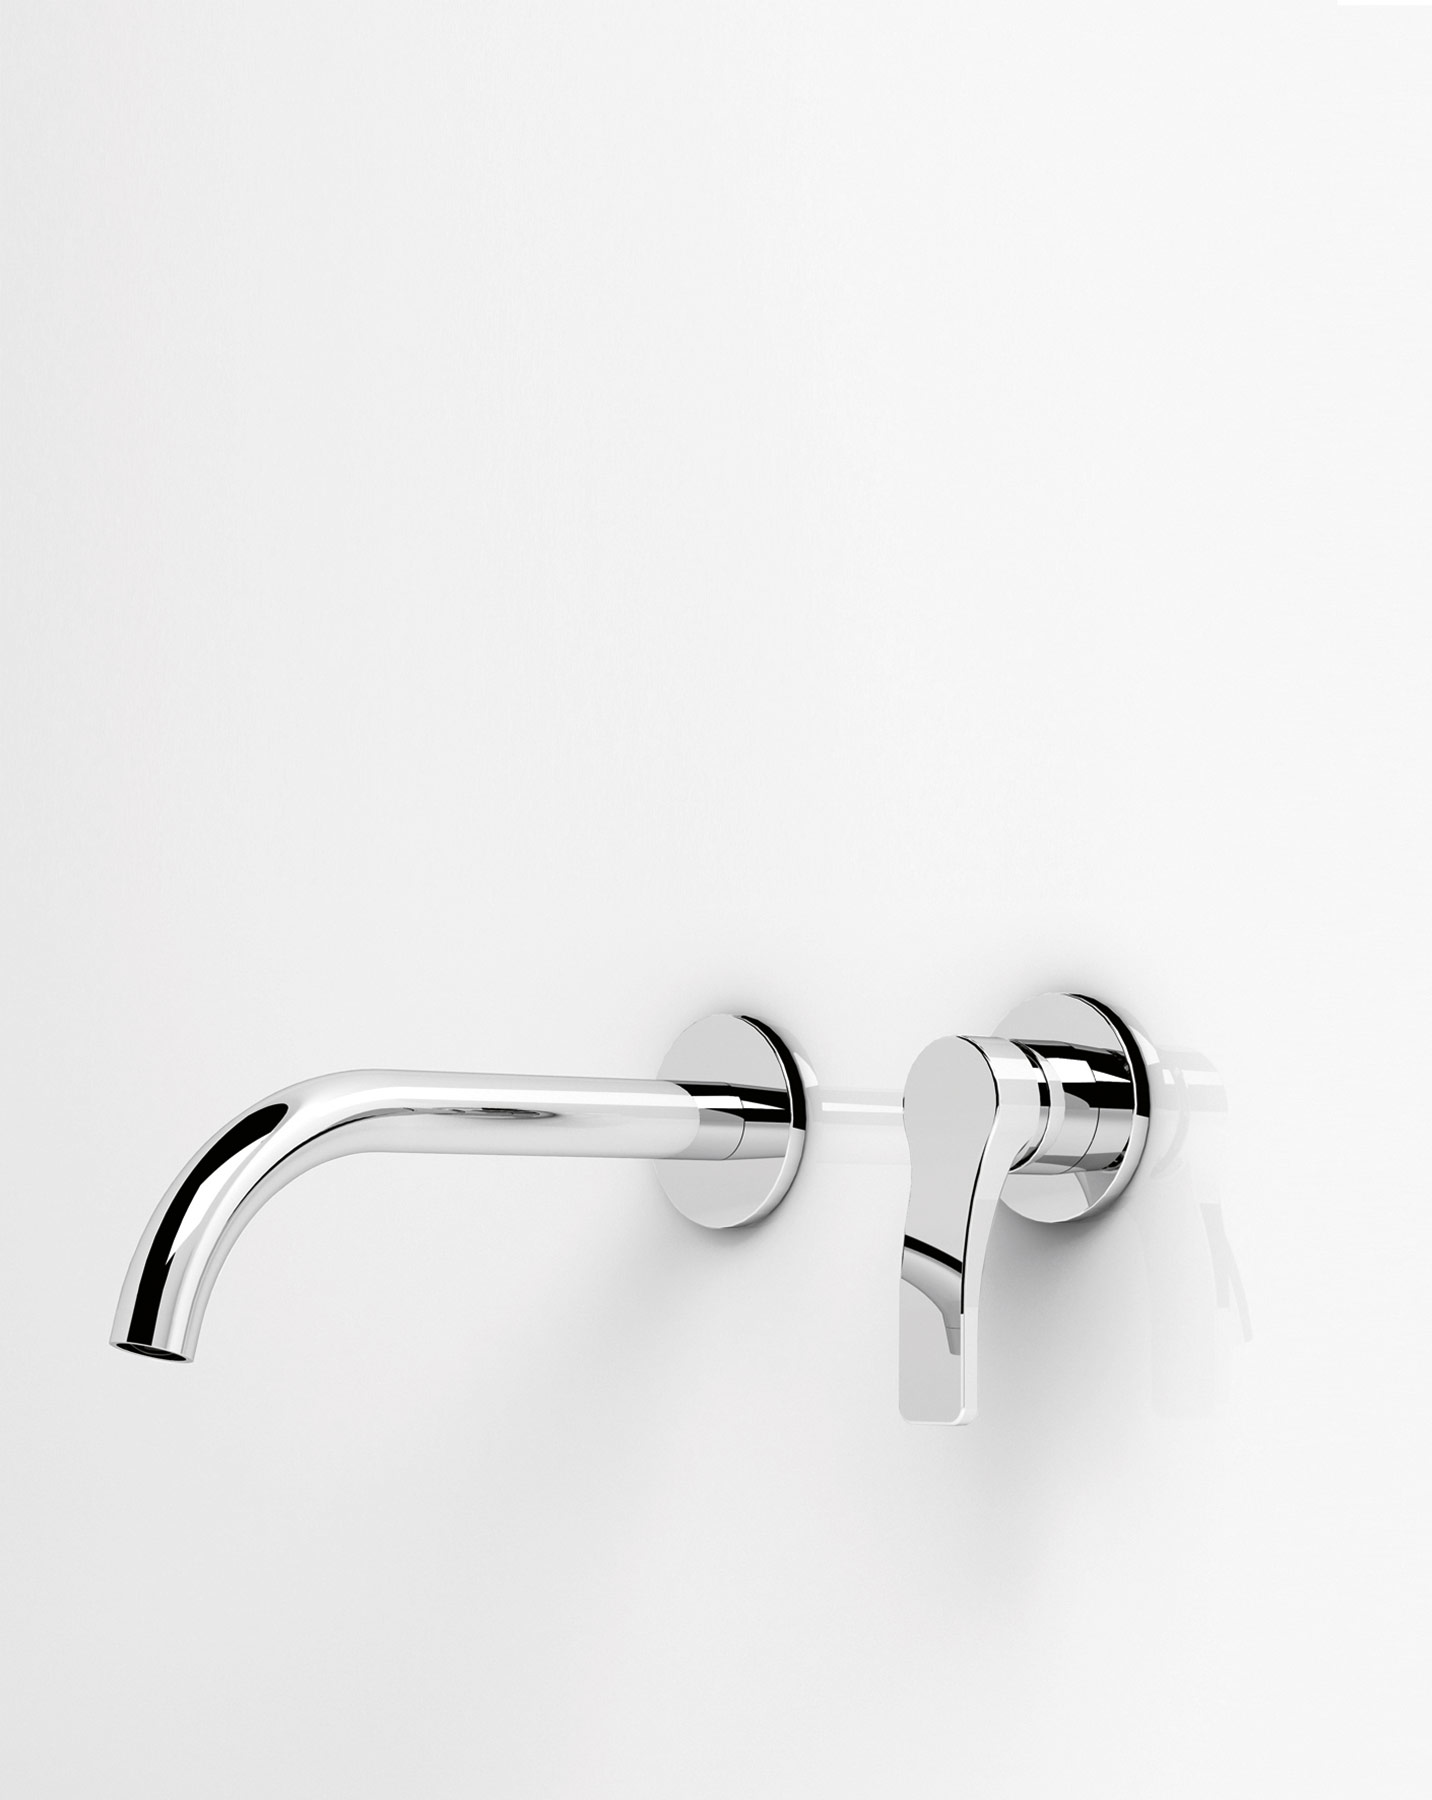 Modern Lissoni Wall Mount Faucet